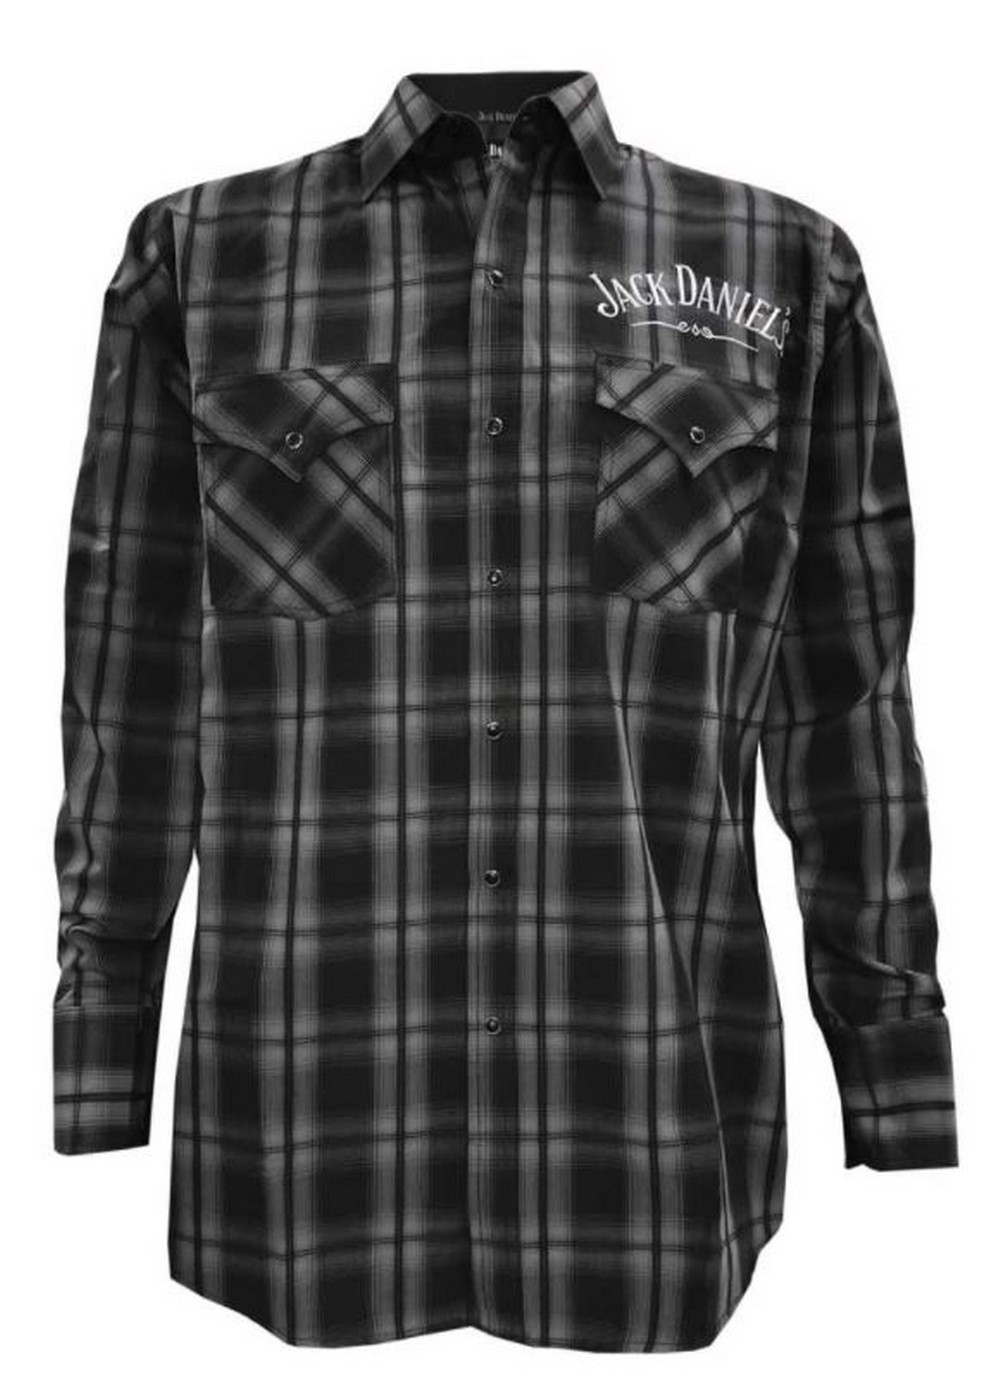 Jack Daniels Men/'s Plaid Embroidery Shirt Cotton Long Sleeve Woven 15203987JD-79